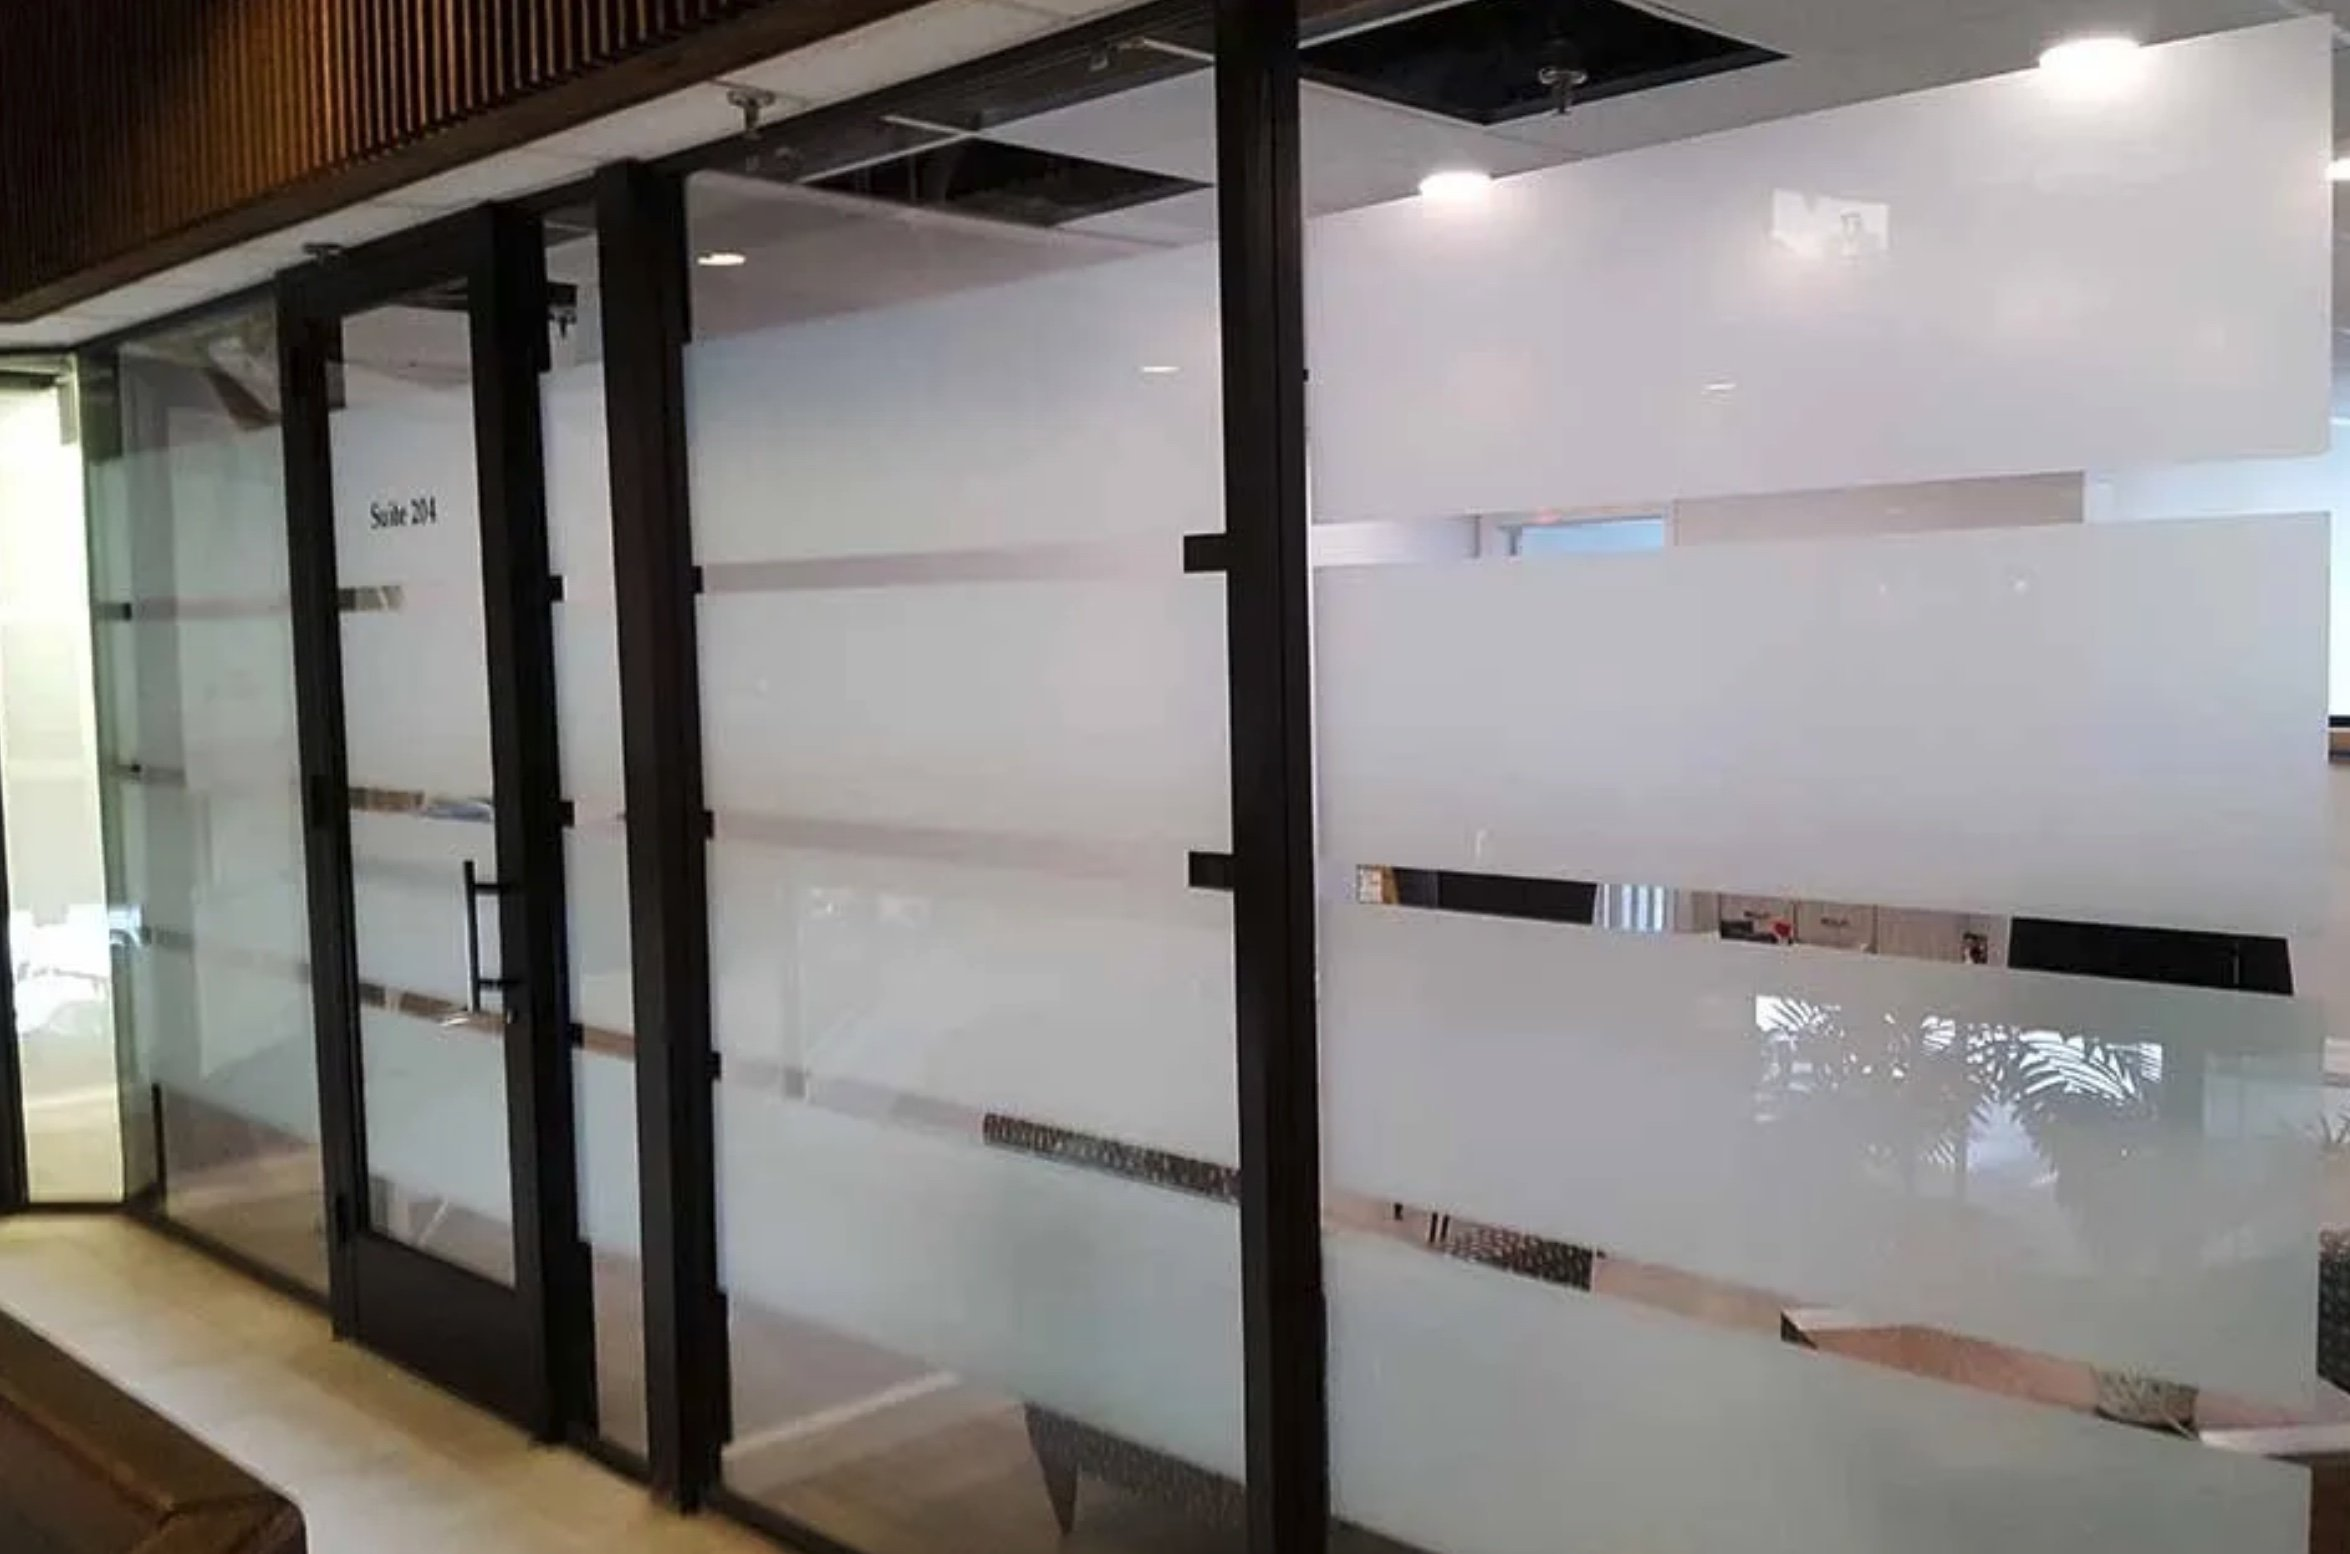 Decorative Window Film - 5 Reasons It's Preferred For Privacy & Branding - Decorative Glass Films in Denver, Colorado